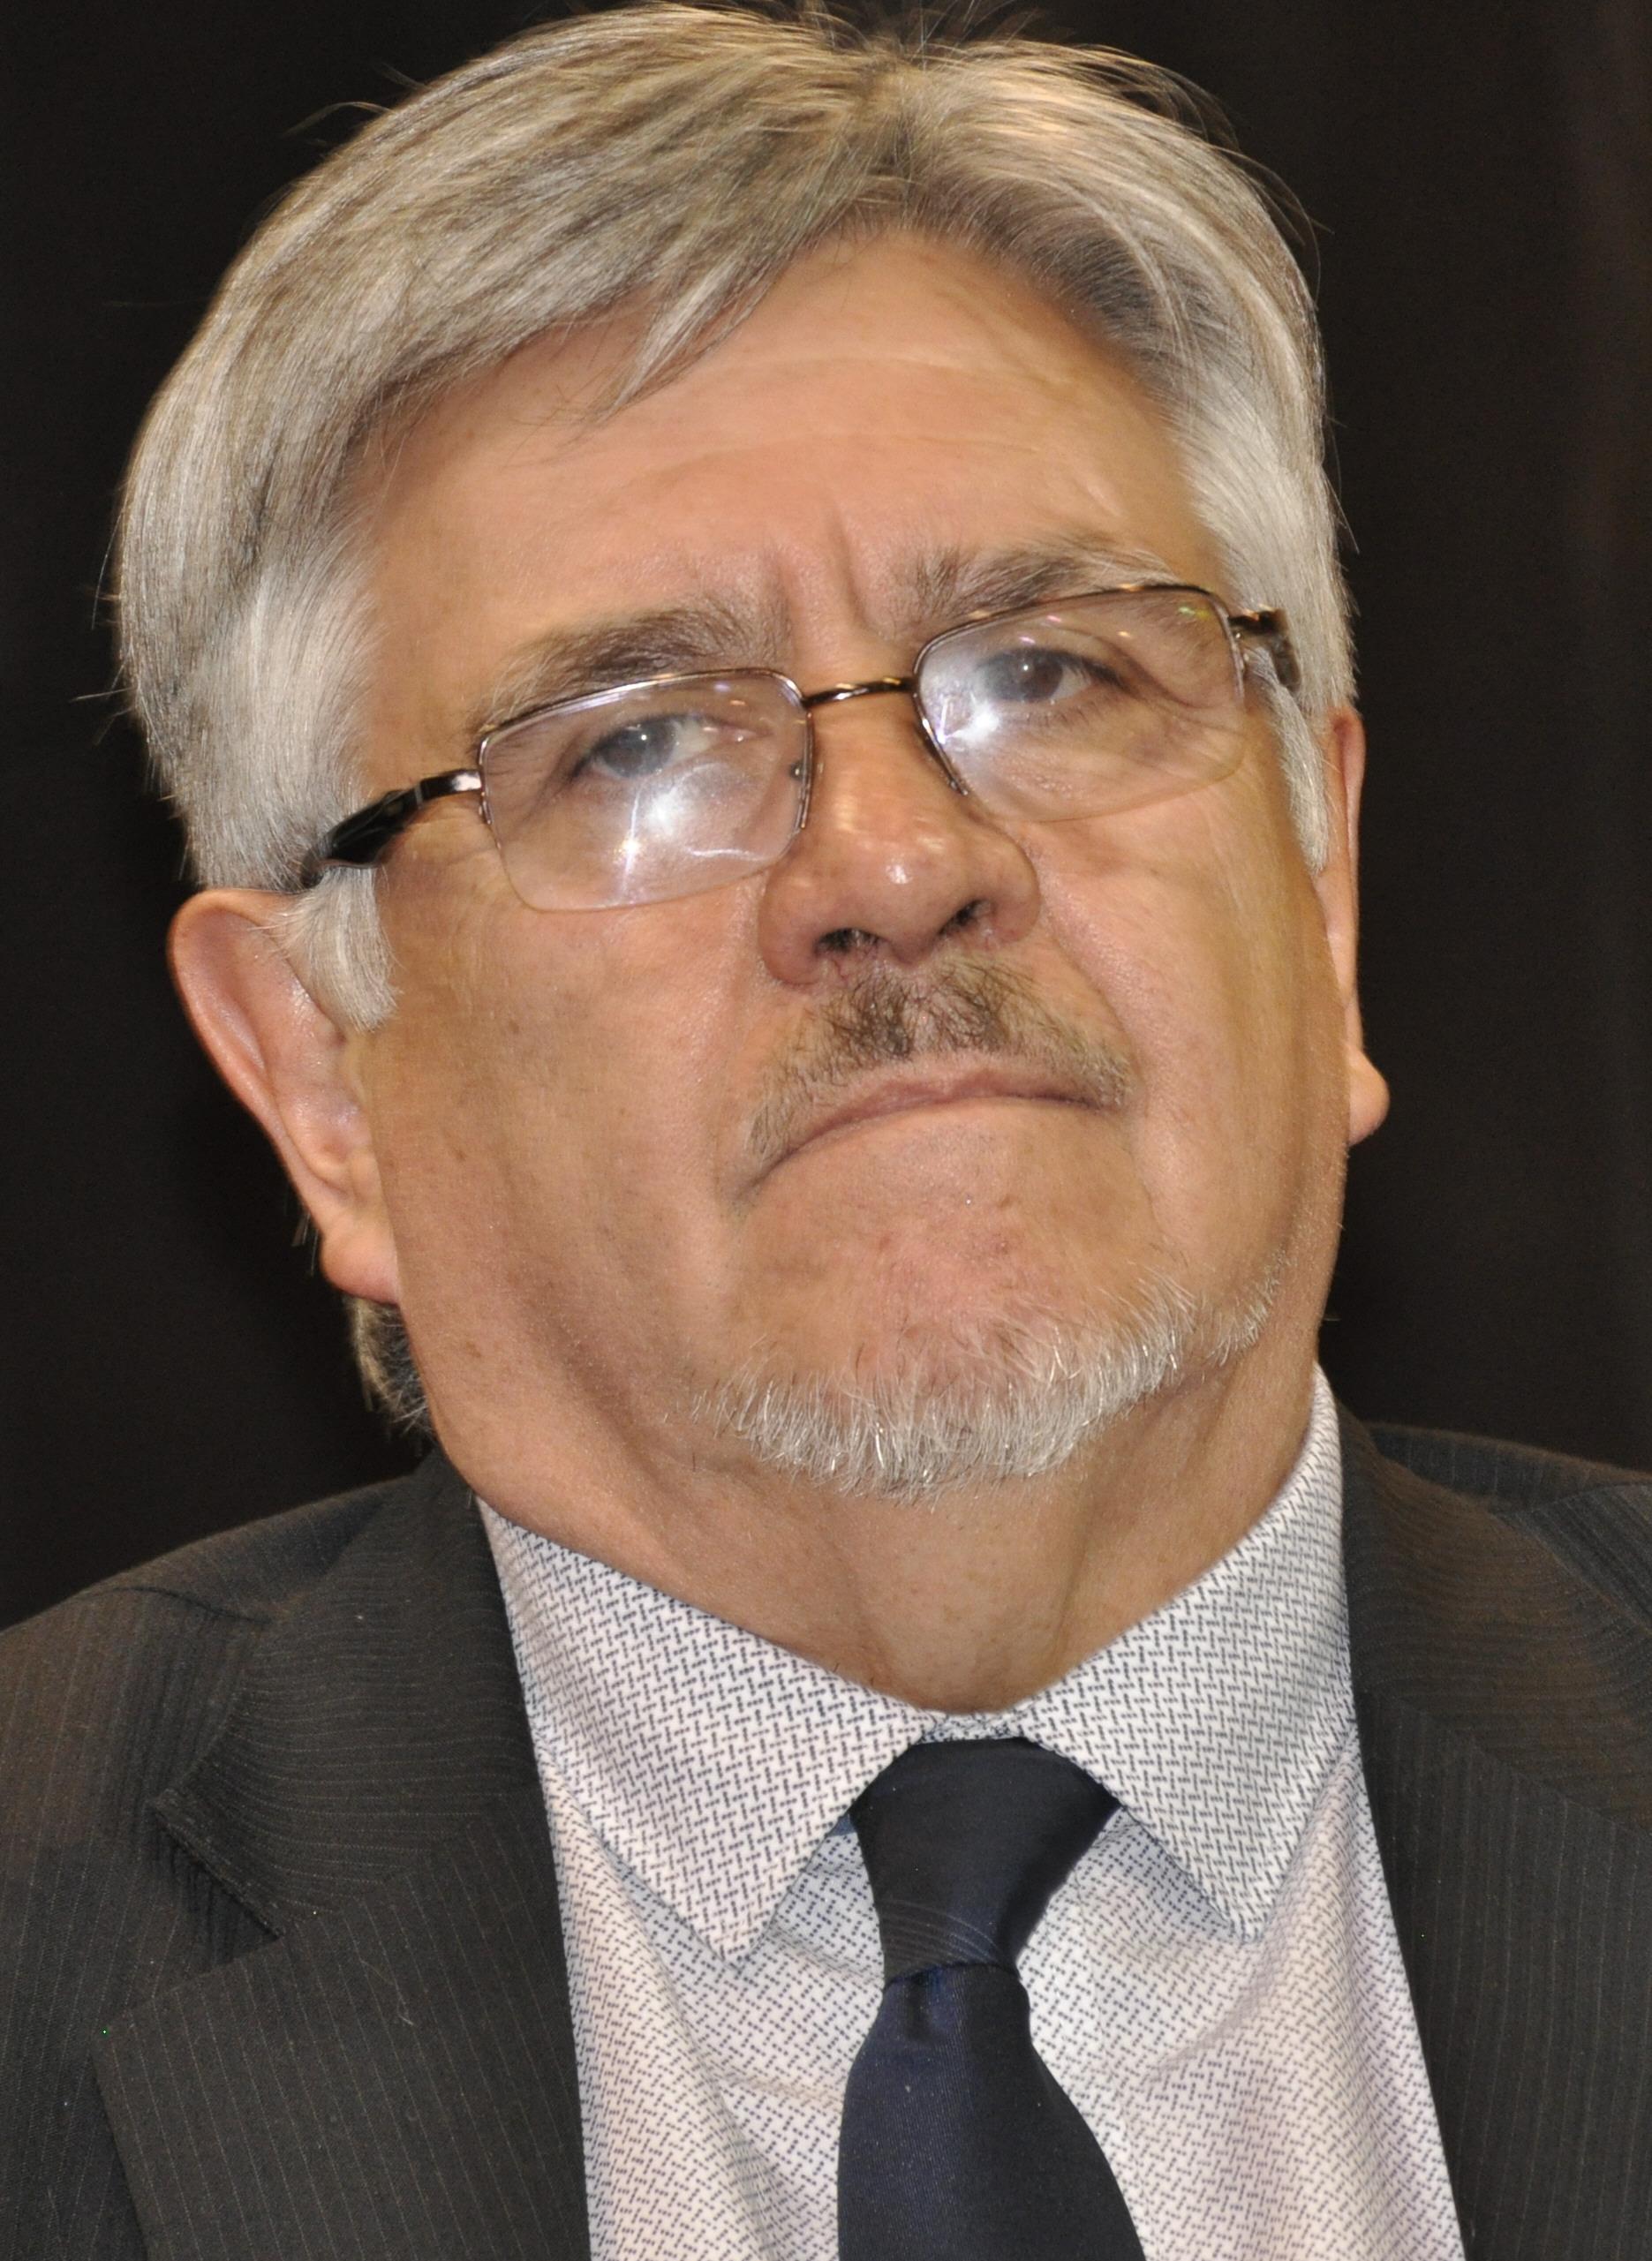 El Dr. Jorge Cabezas. FOTO: ARCHIVO